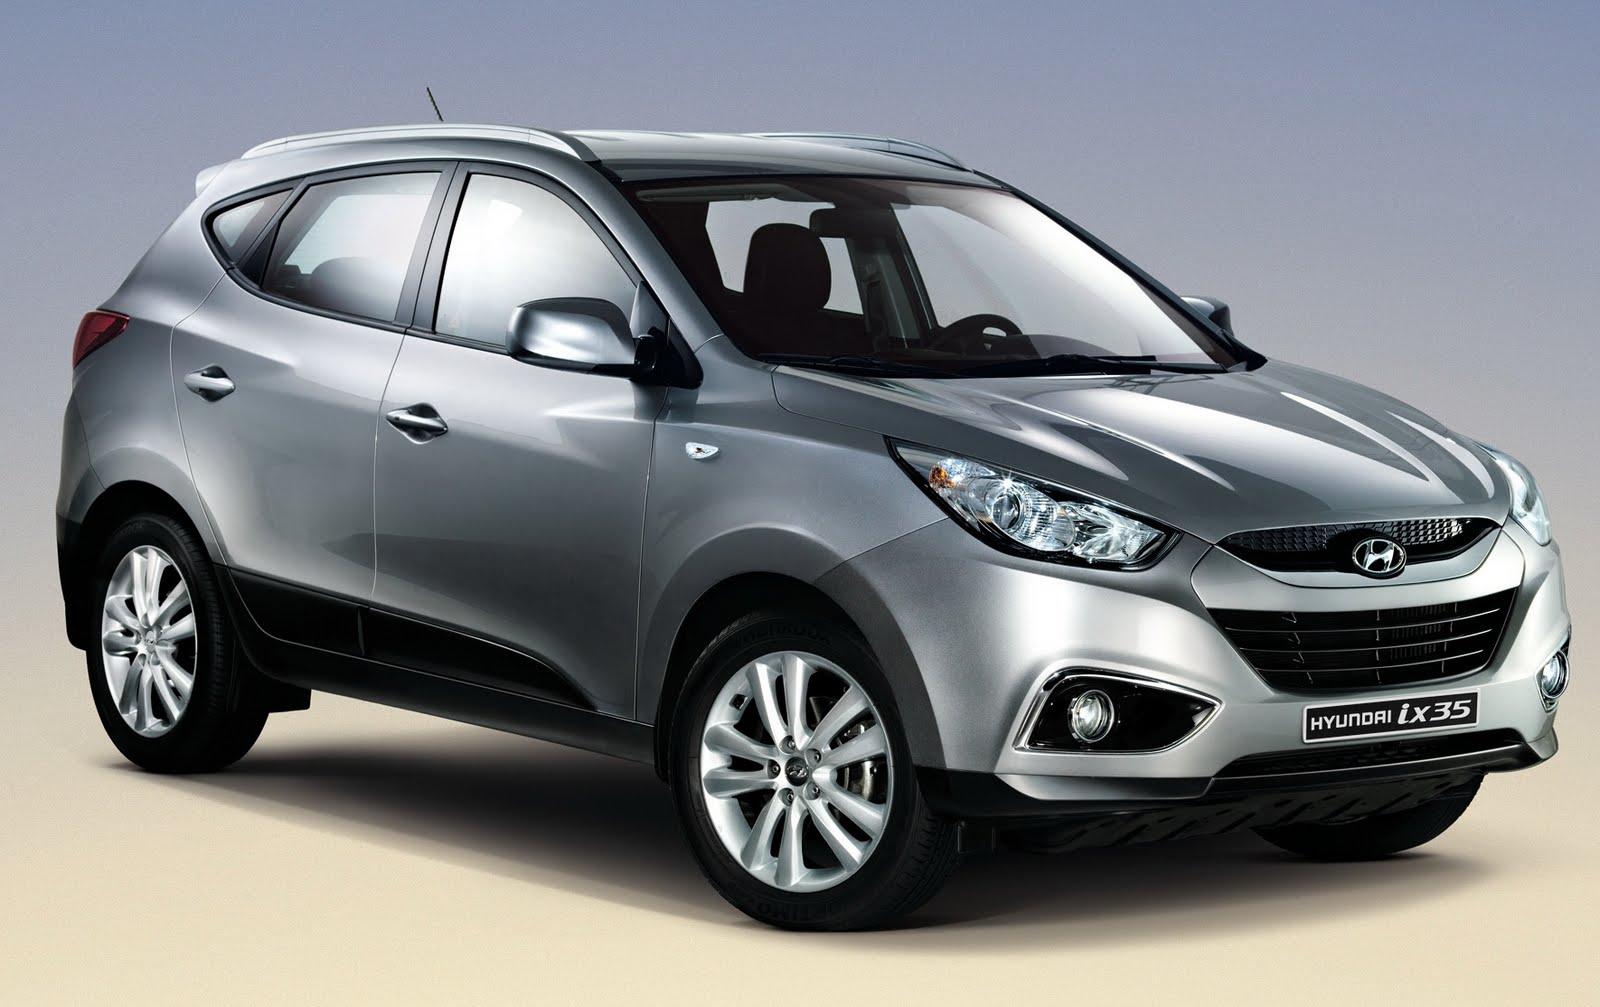 Hyundai ix35 Km 0